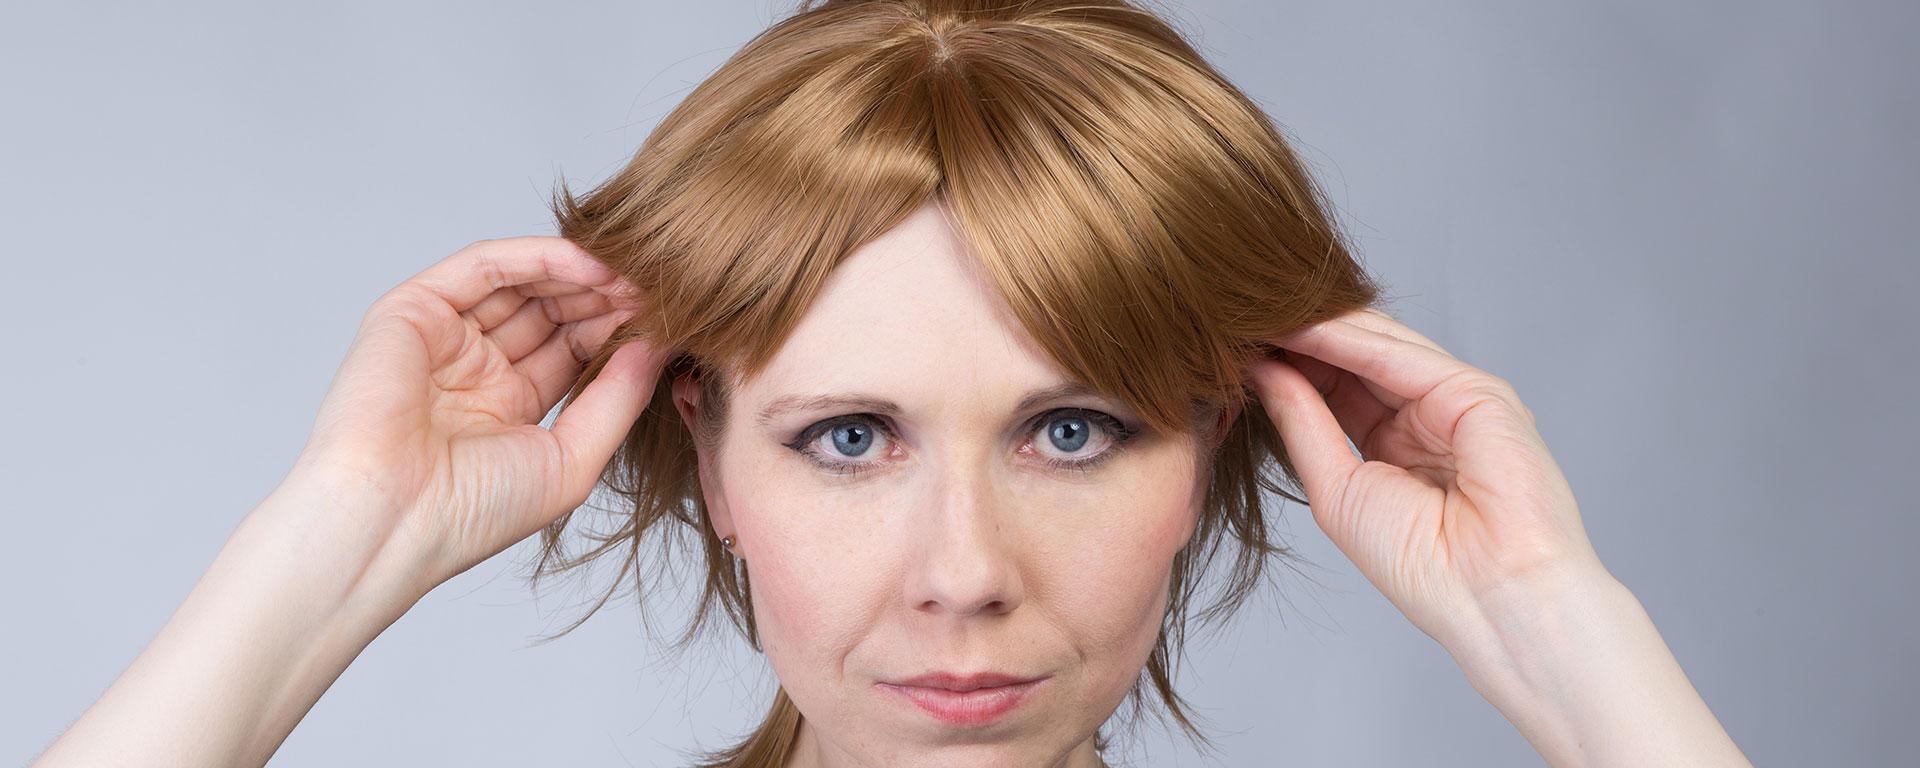 Kukkii putting on a wig